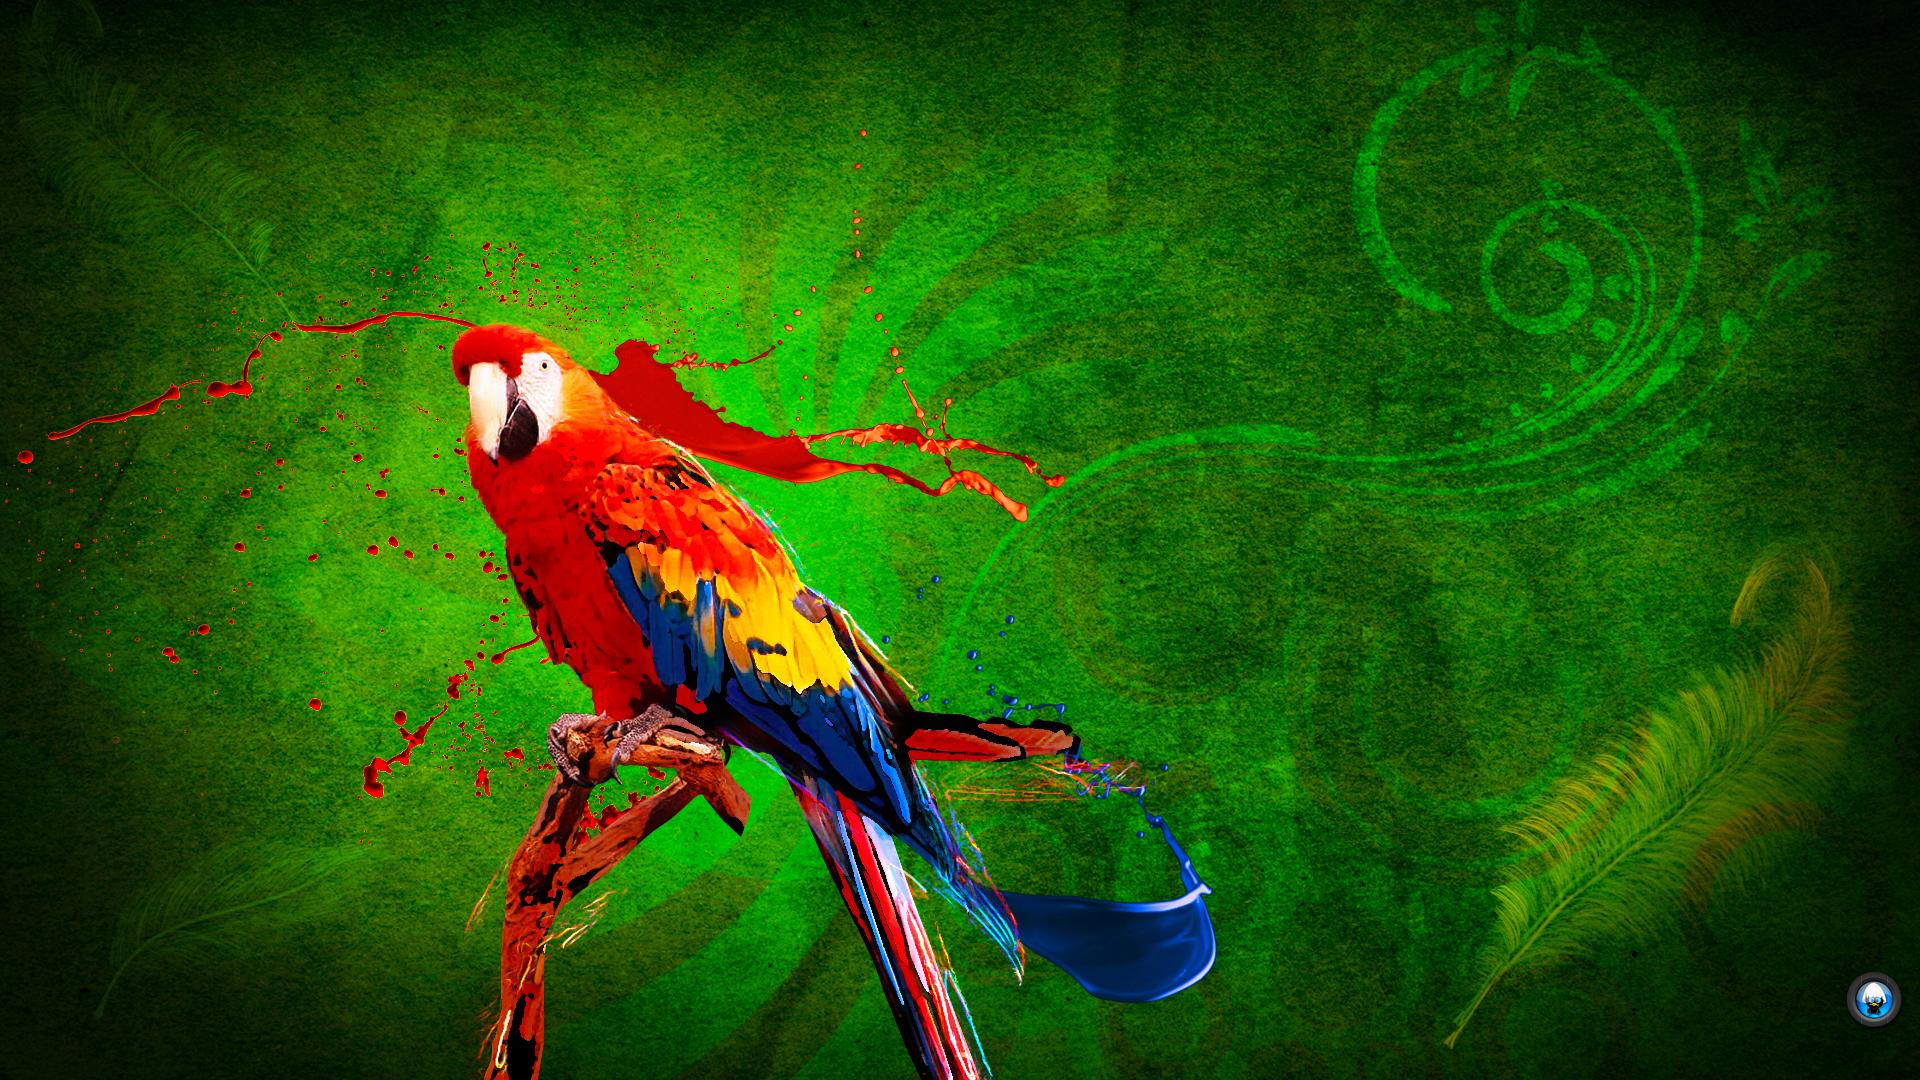 Parrot HD wallpaper 1920x1080 1   hebusorg   High Definition 1920x1080